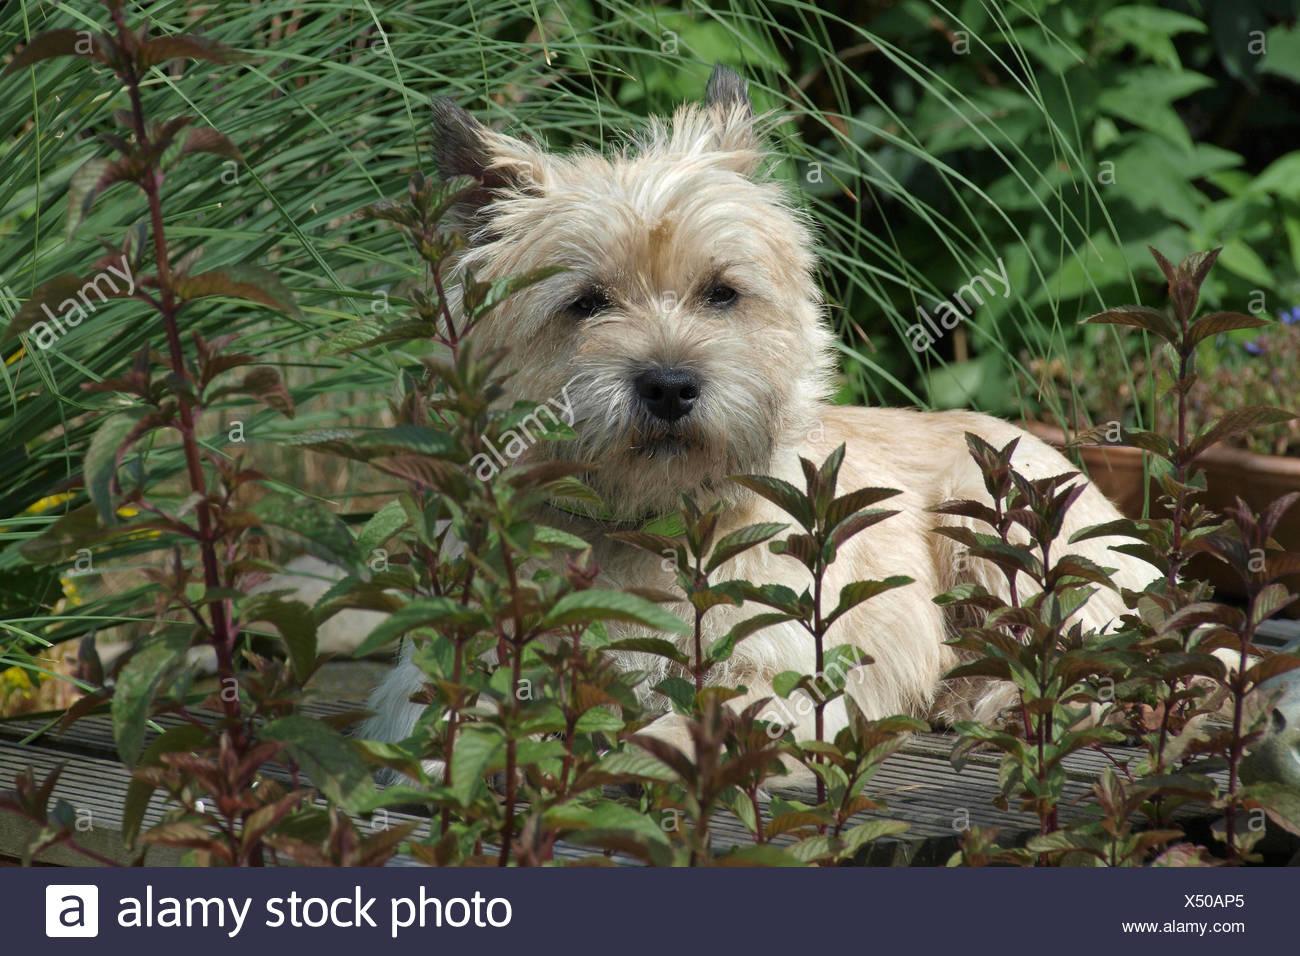 dog terrier species animal dog species pedigree cairn hunderasse cairn terrier - Stock Image